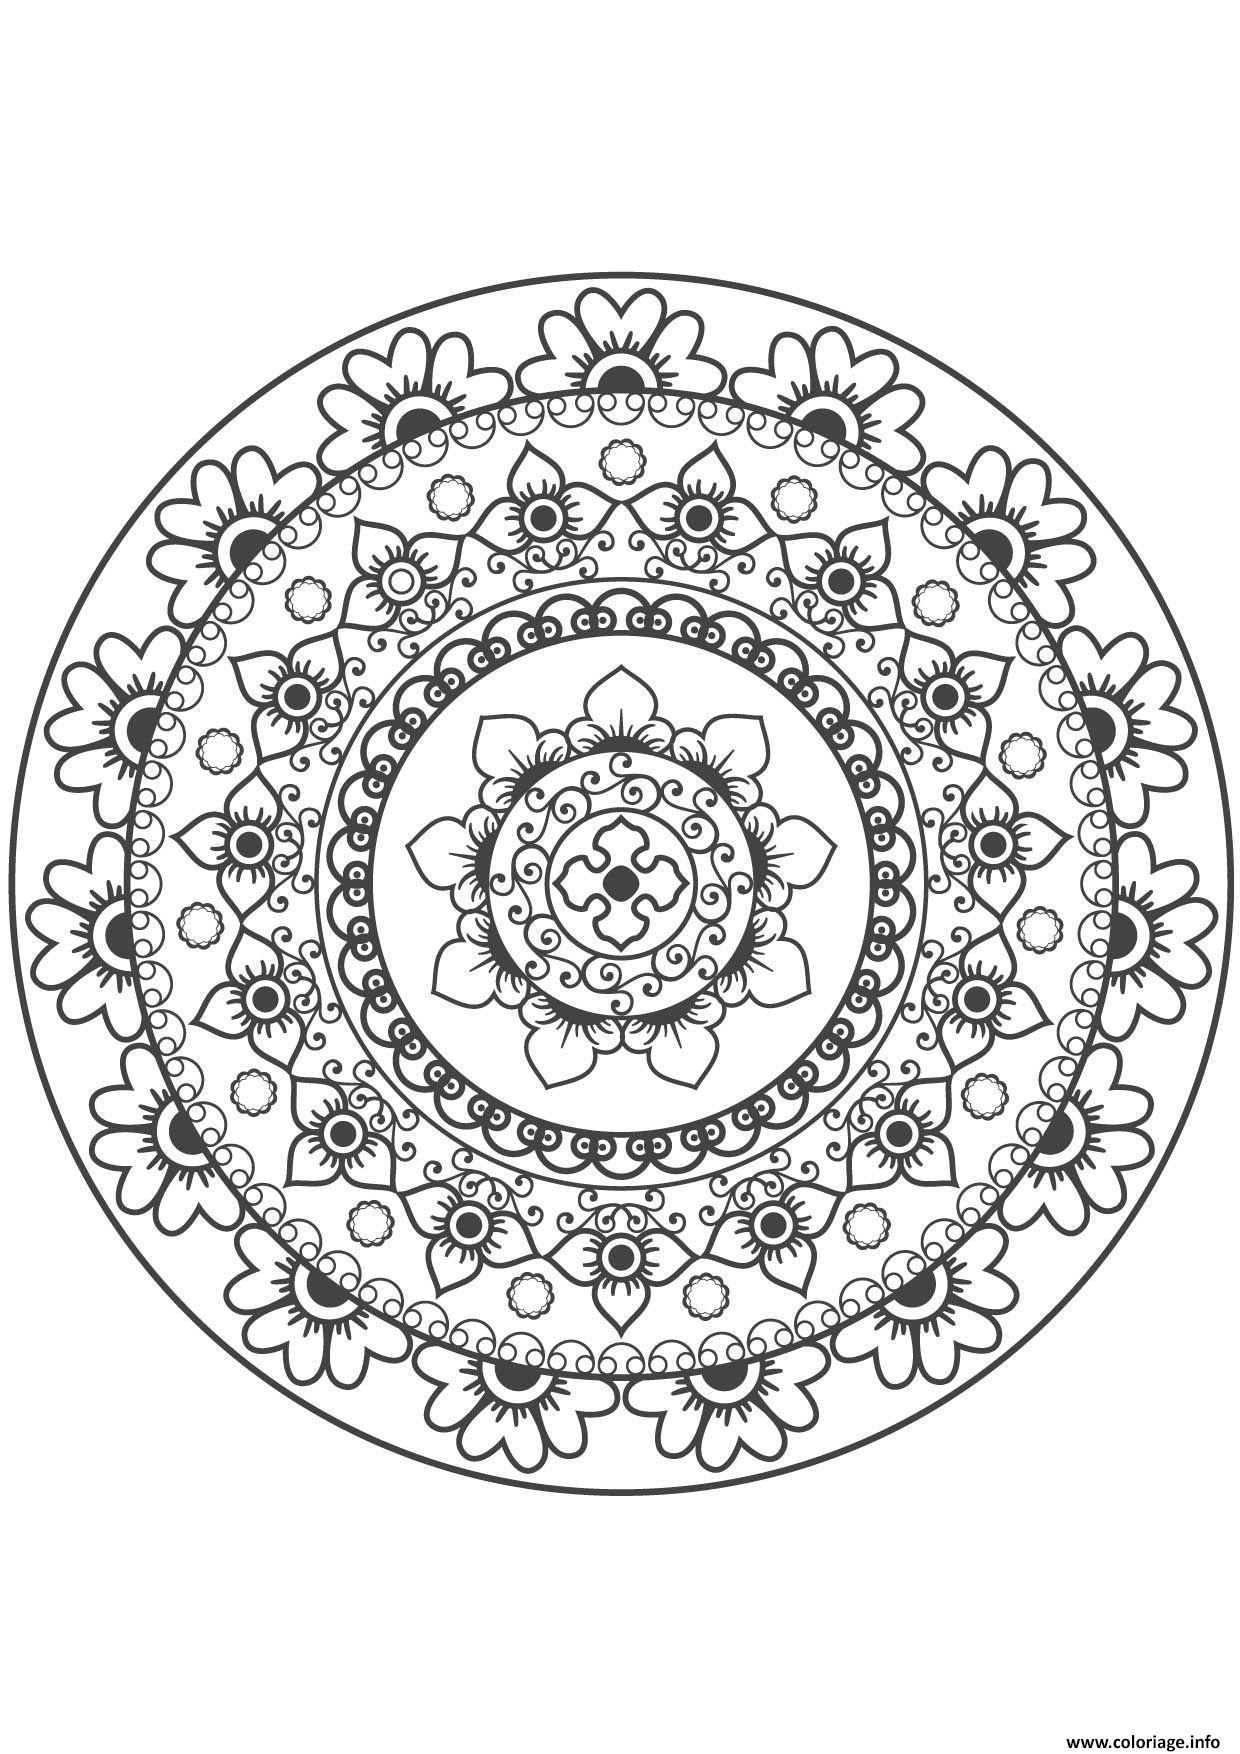 Coloriage Gulli Mandala Fleur 10 dessin